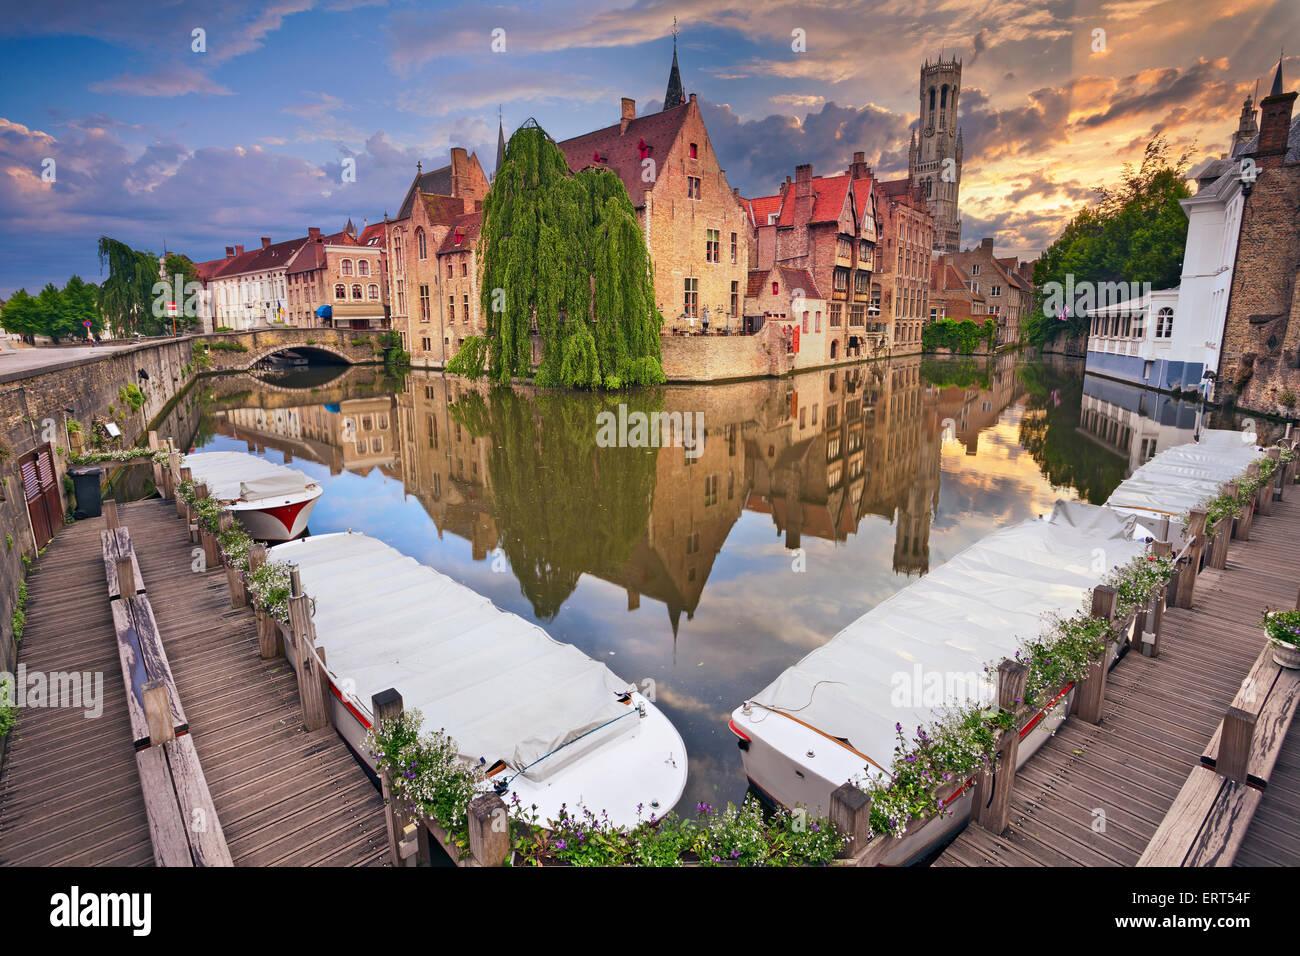 Brügge. Bild des berühmten meistfotografierte Ort in Brügge, Belgien während dramatischen Sonnenuntergang. Stockbild